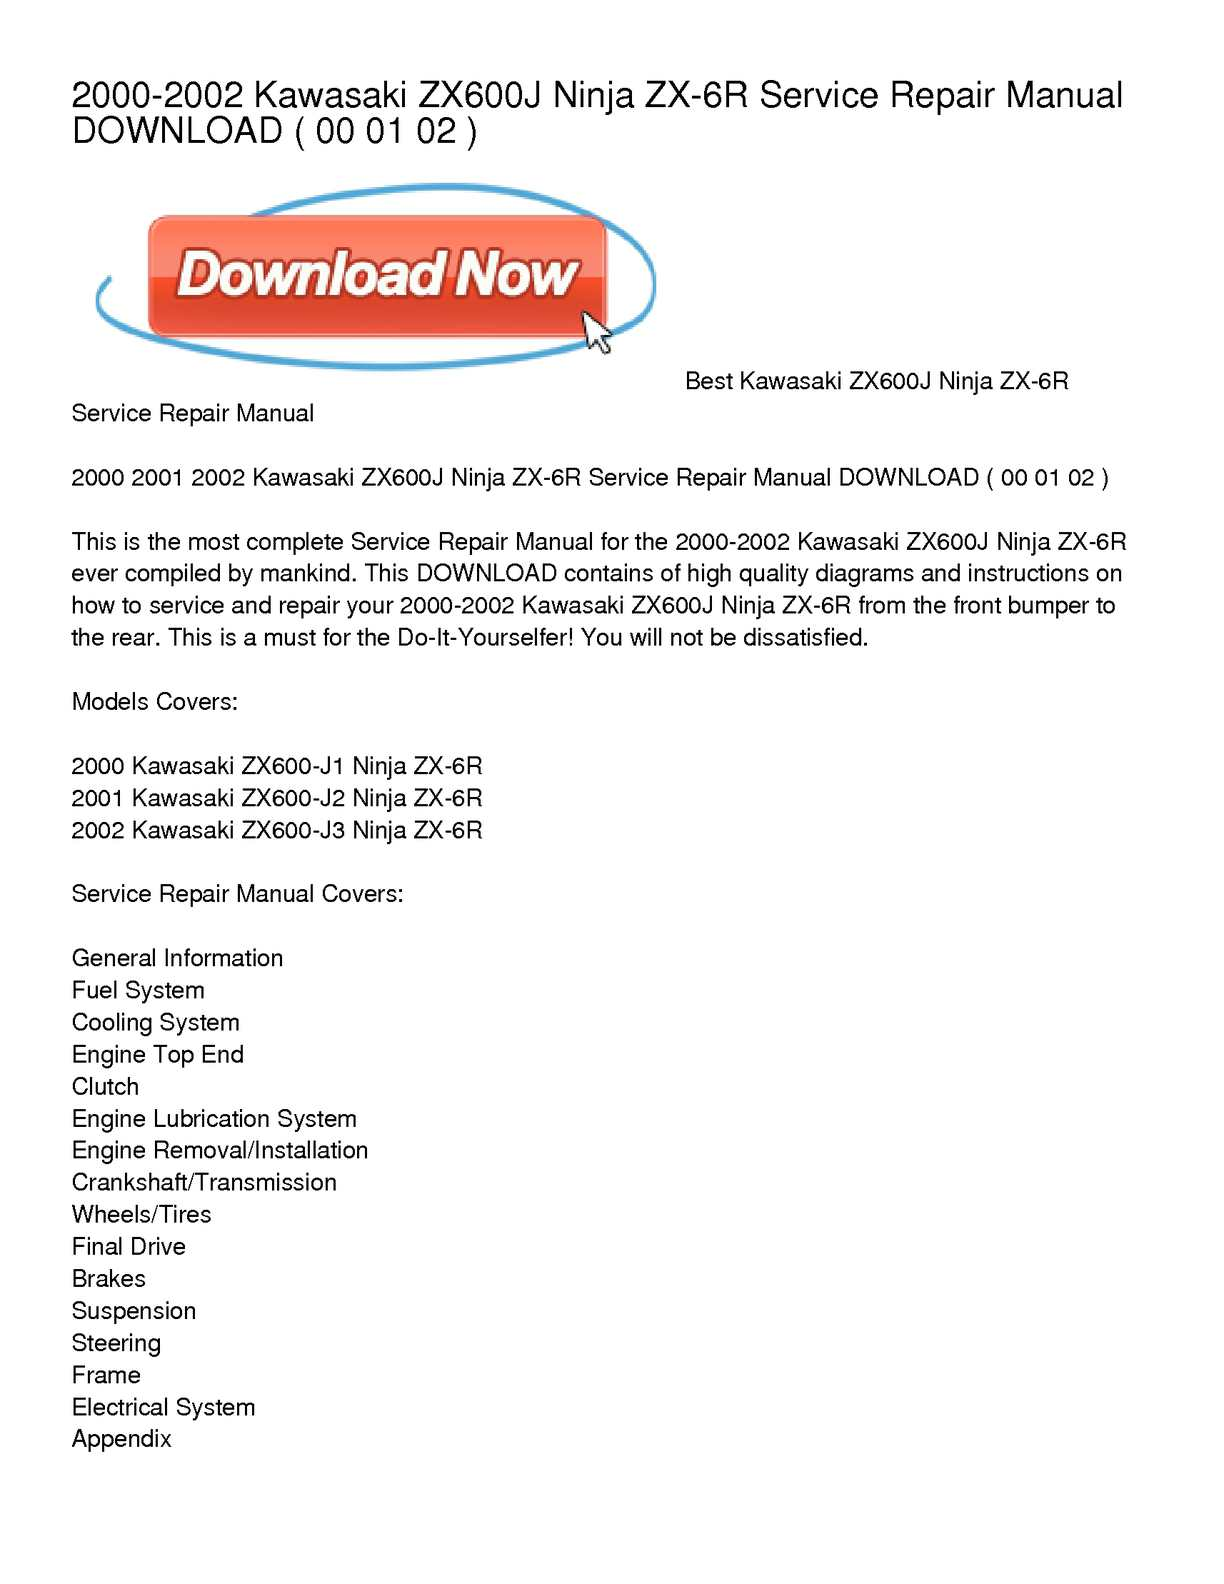 Calameo 2000 2002 Kawasaki Zx600j Ninja Zx 6r Service Repair Manual Download